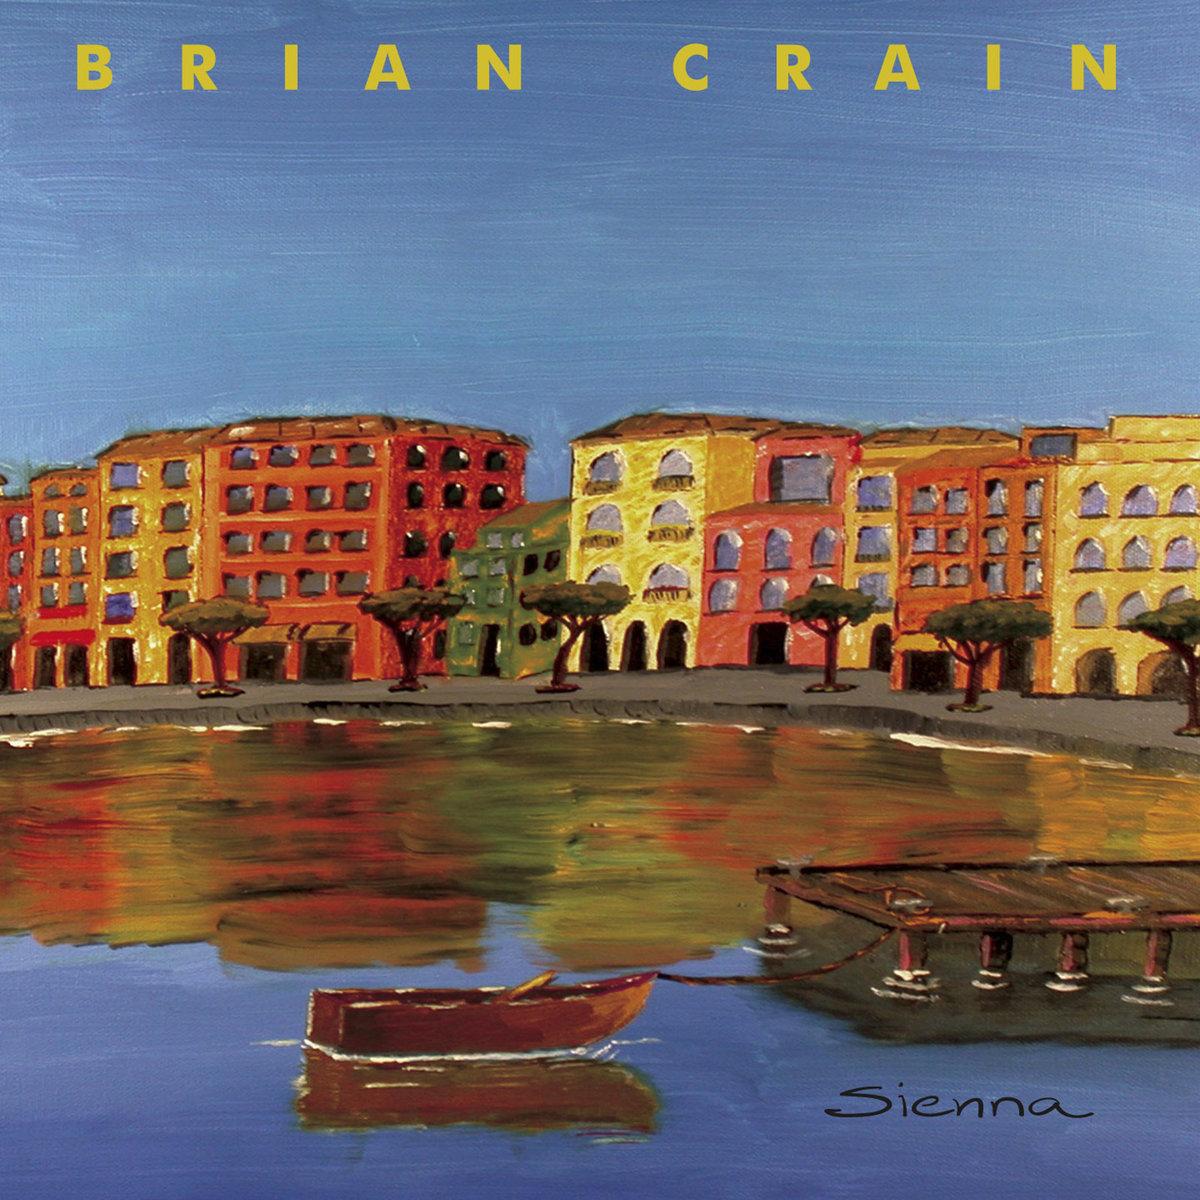 BRIAN CRAIN - SIENNA